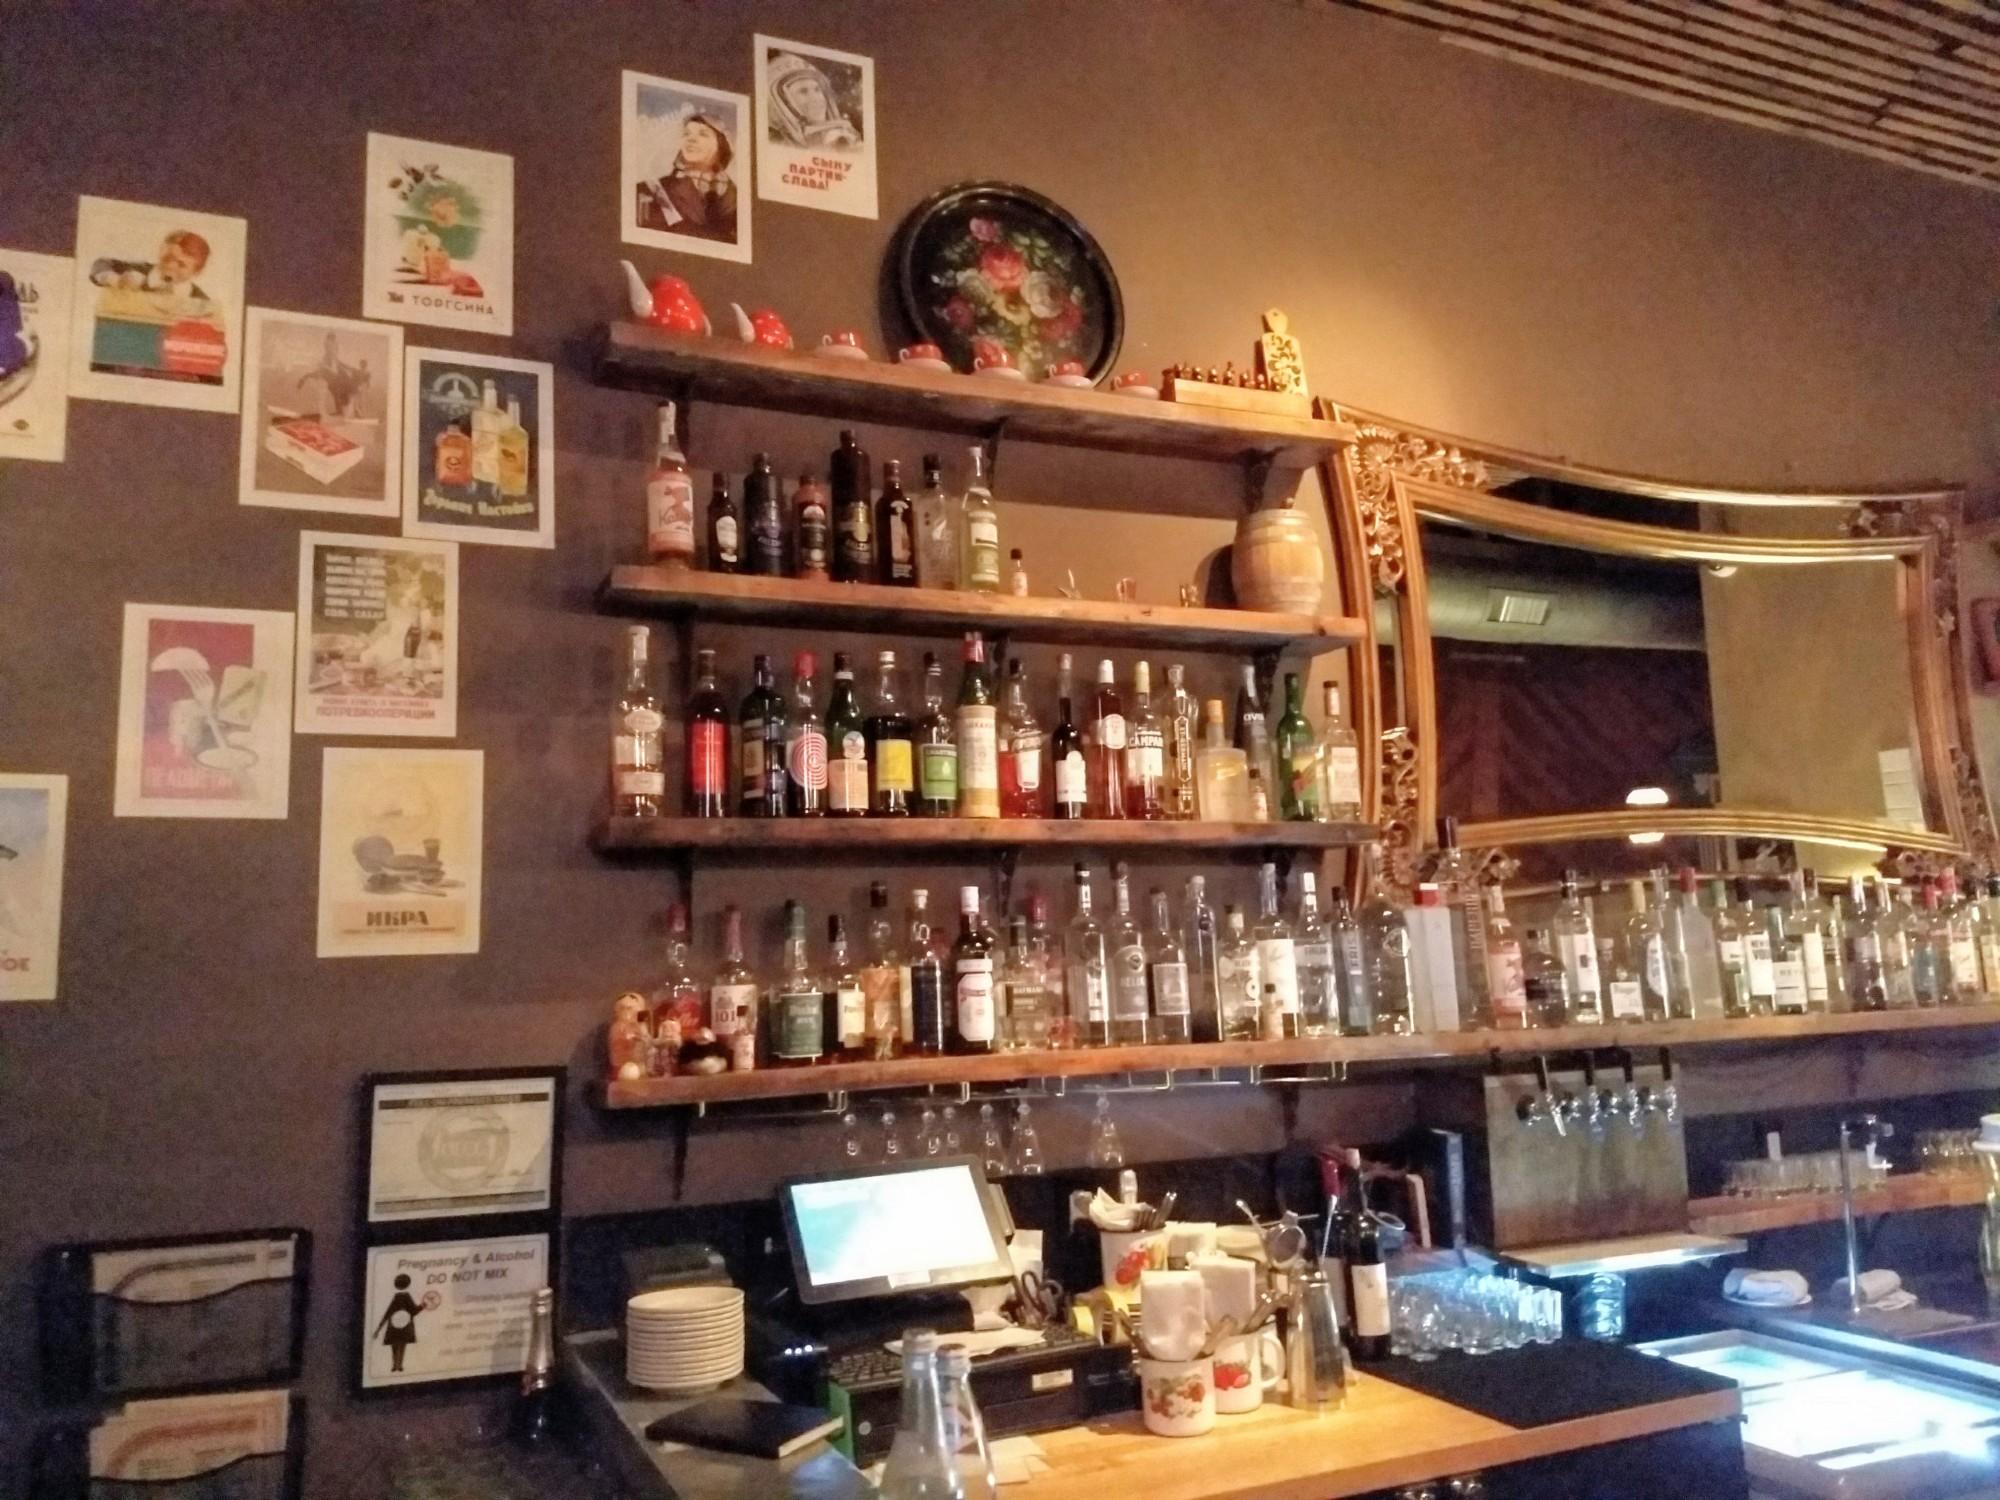 bar with bottles and a mirror at Kachinka